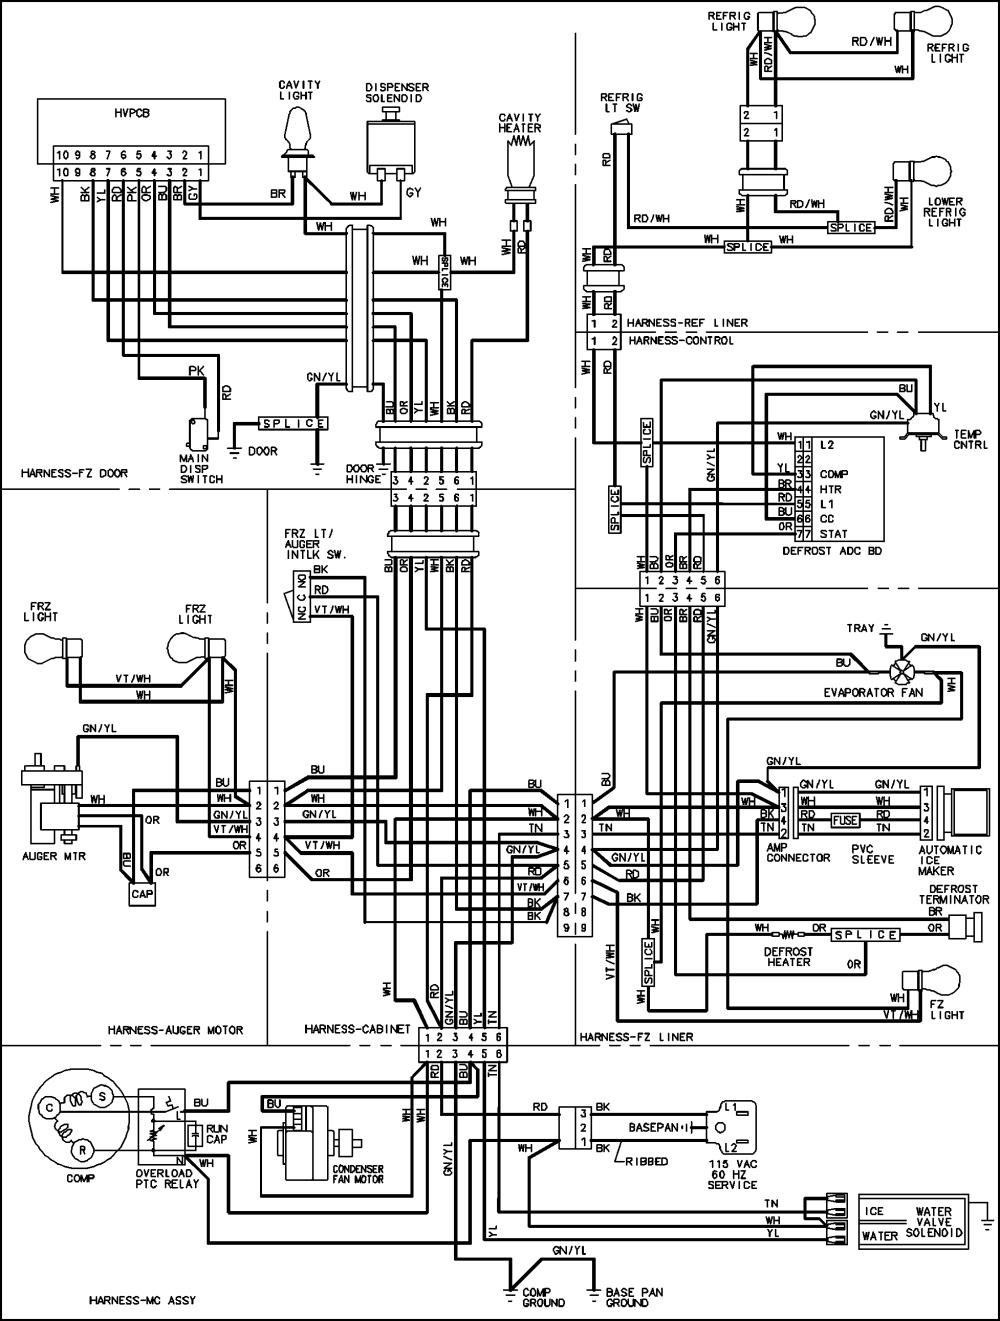 medium resolution of white knight tumble dryer wiring diagram gibson dryer dryer motor wiring diagram frigidaire dryer wiring diagram